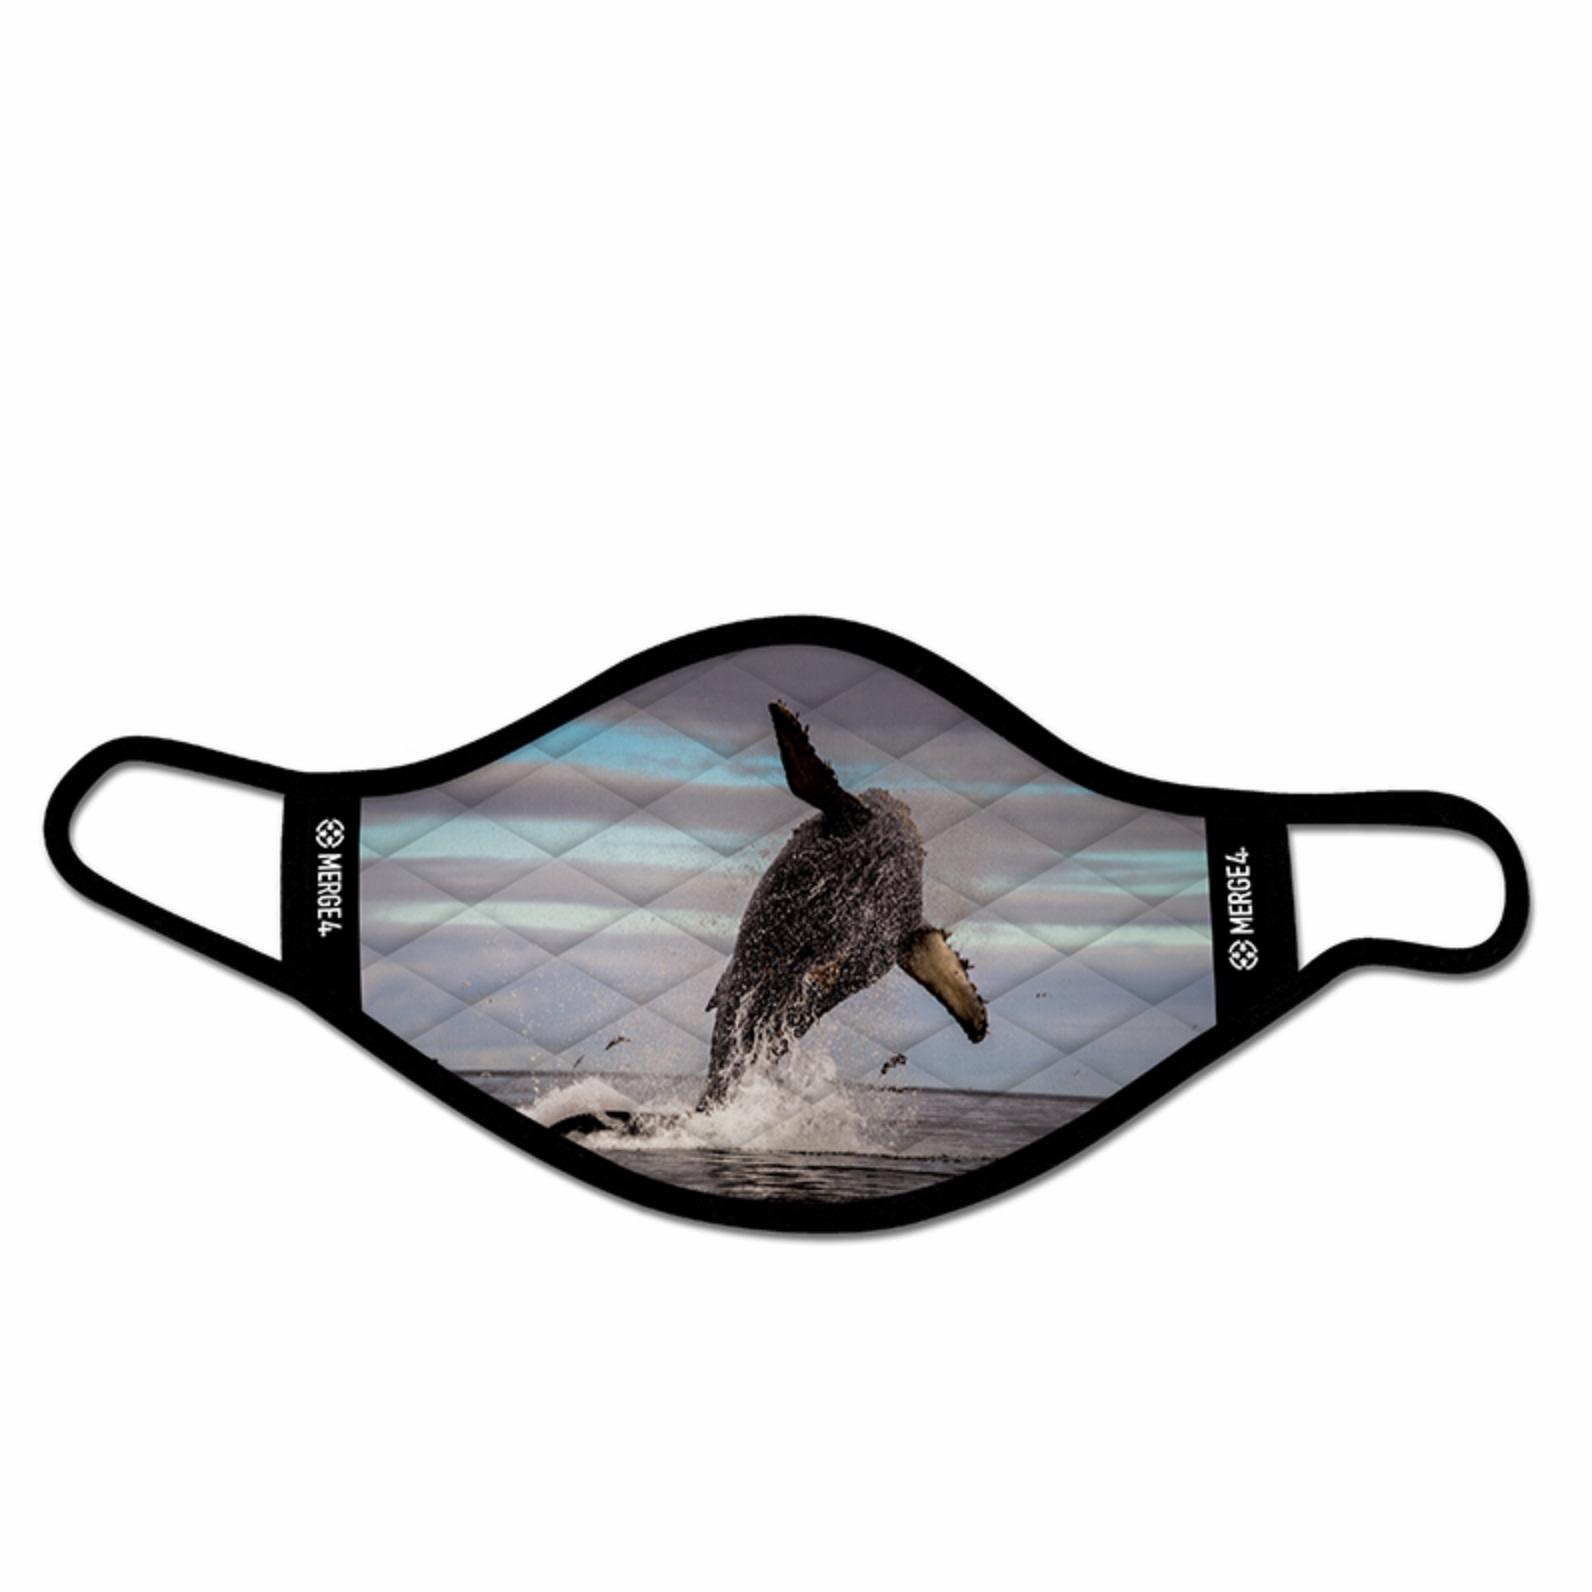 Merge 4 Merge 4 -Dave Nelson Whale Mask